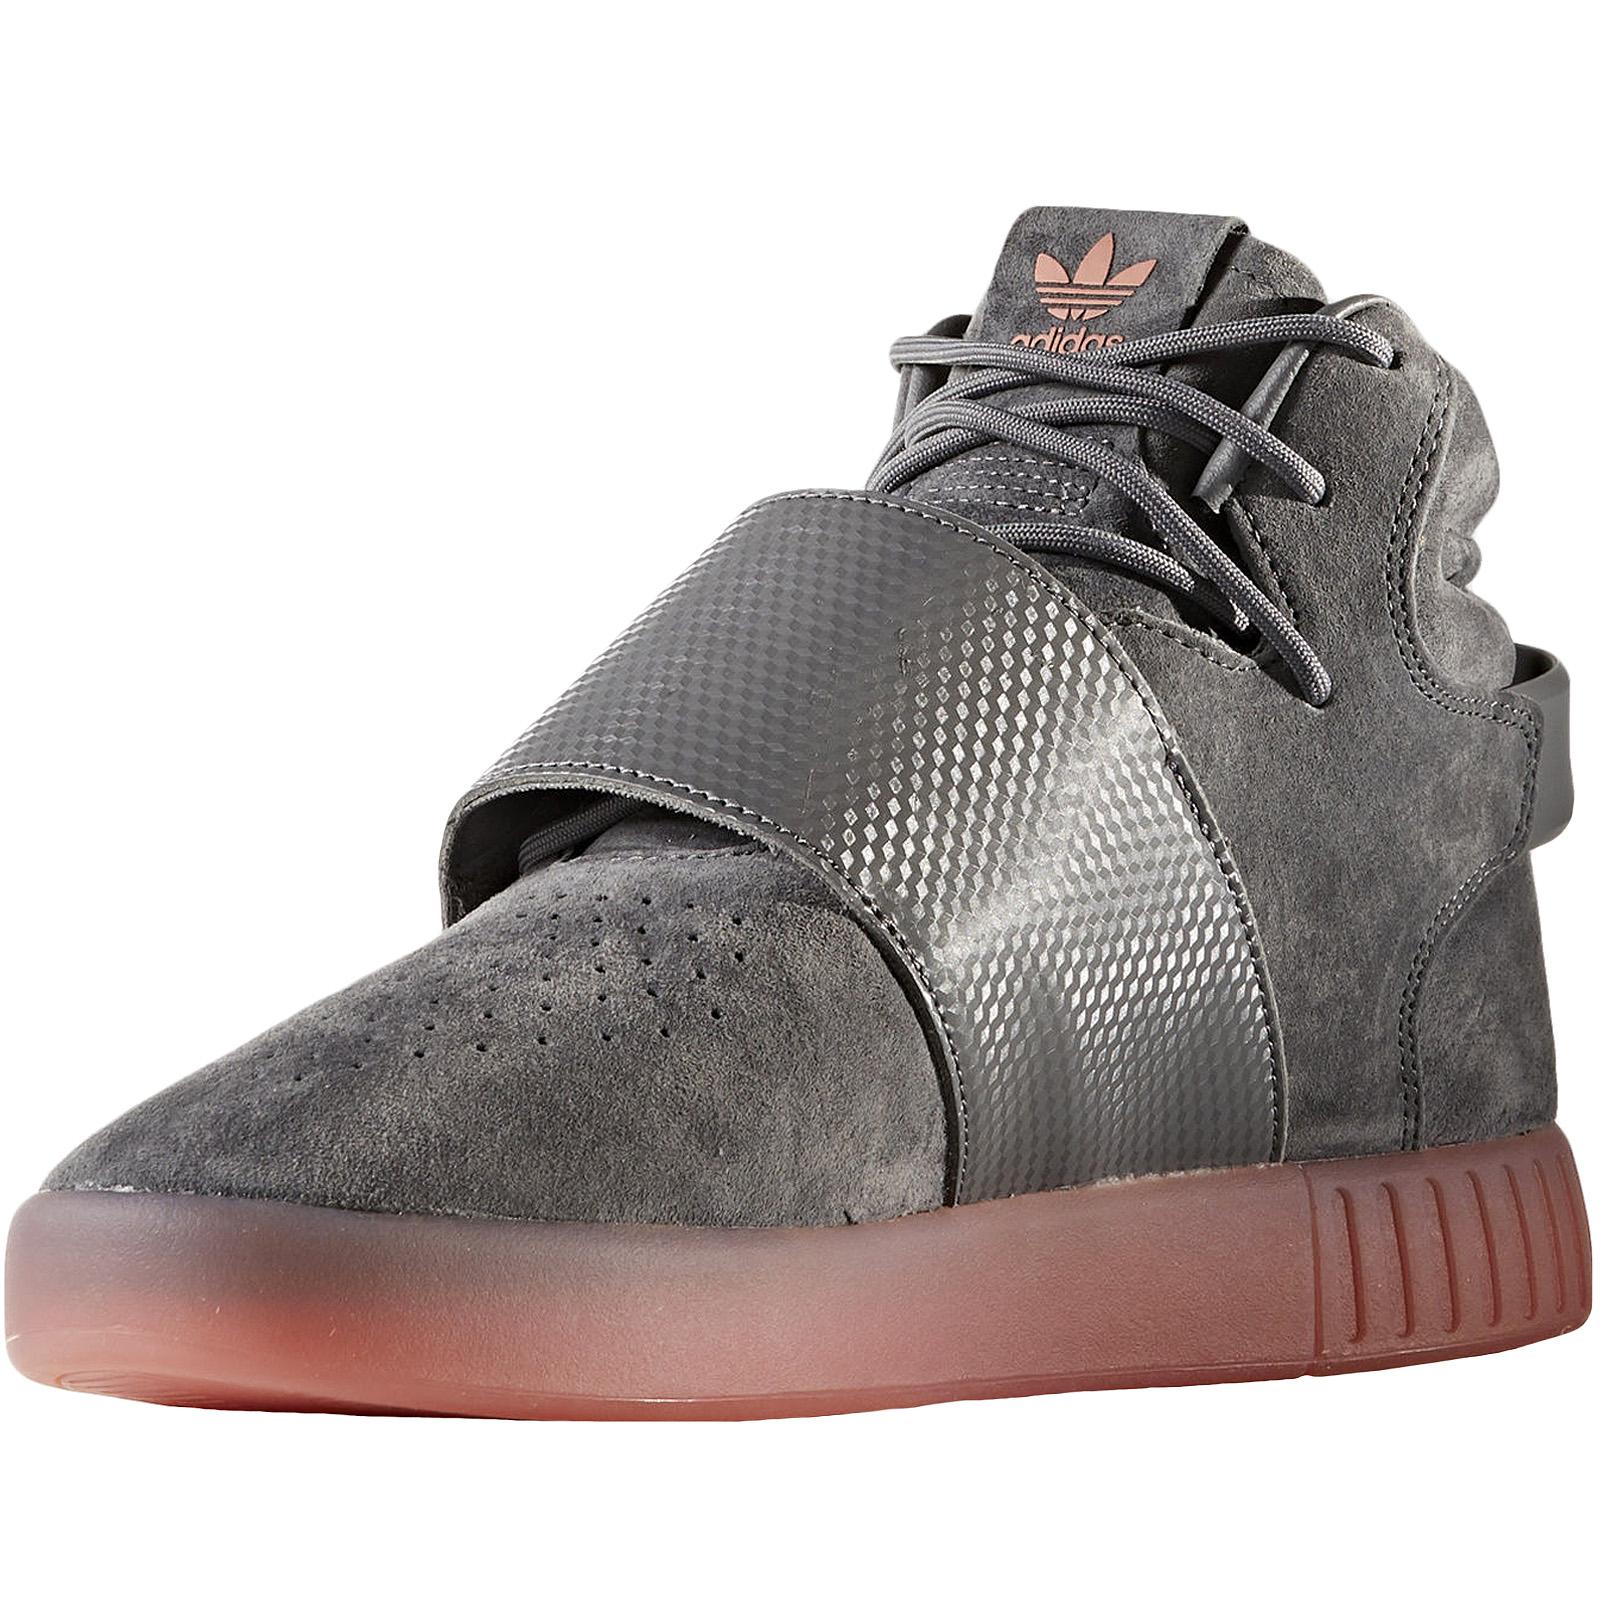 adidas-Originals-Mens-Tubular-Invader-Strap-Casual-Lace-Up-Hi-Top-Trainers-Shoes thumbnail 15